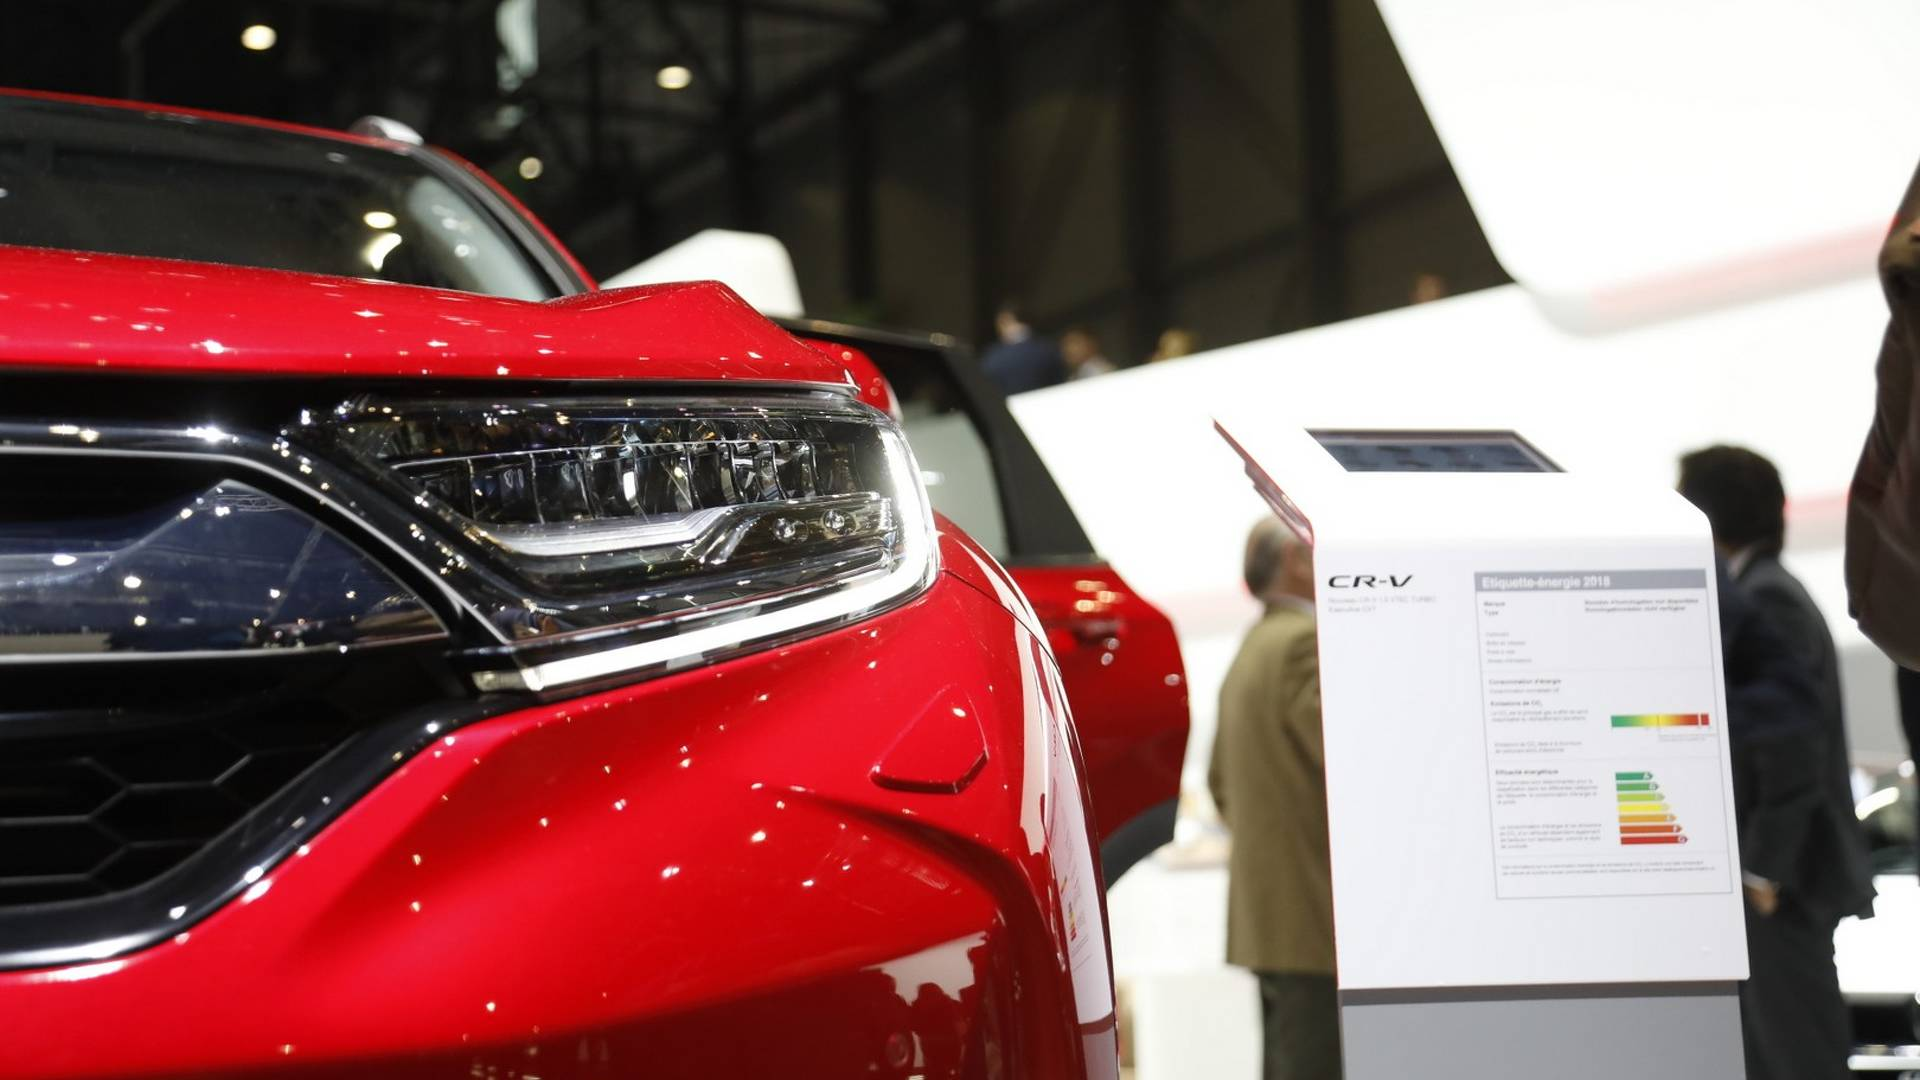 New Honda Cr V Euro Spec Live From Geneva Motor Show Hyundai 3 5l Engine Parts Breakdown